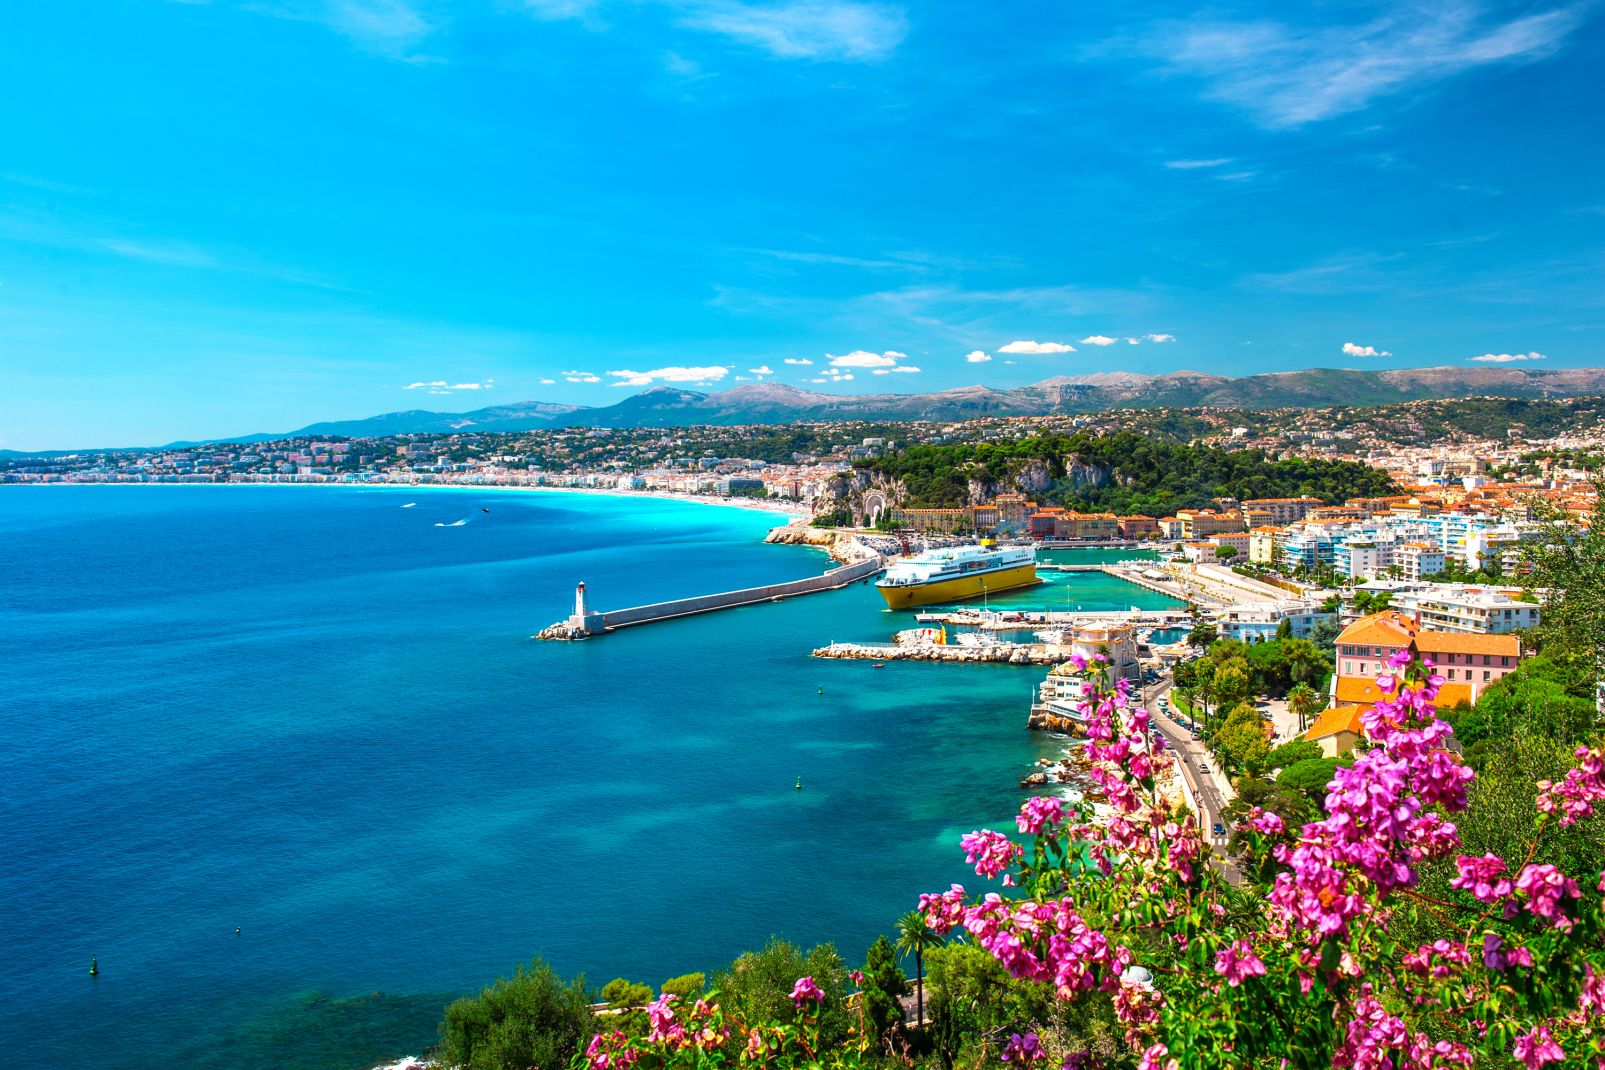 Provence-Alpes-Côte d'Azur, Francia